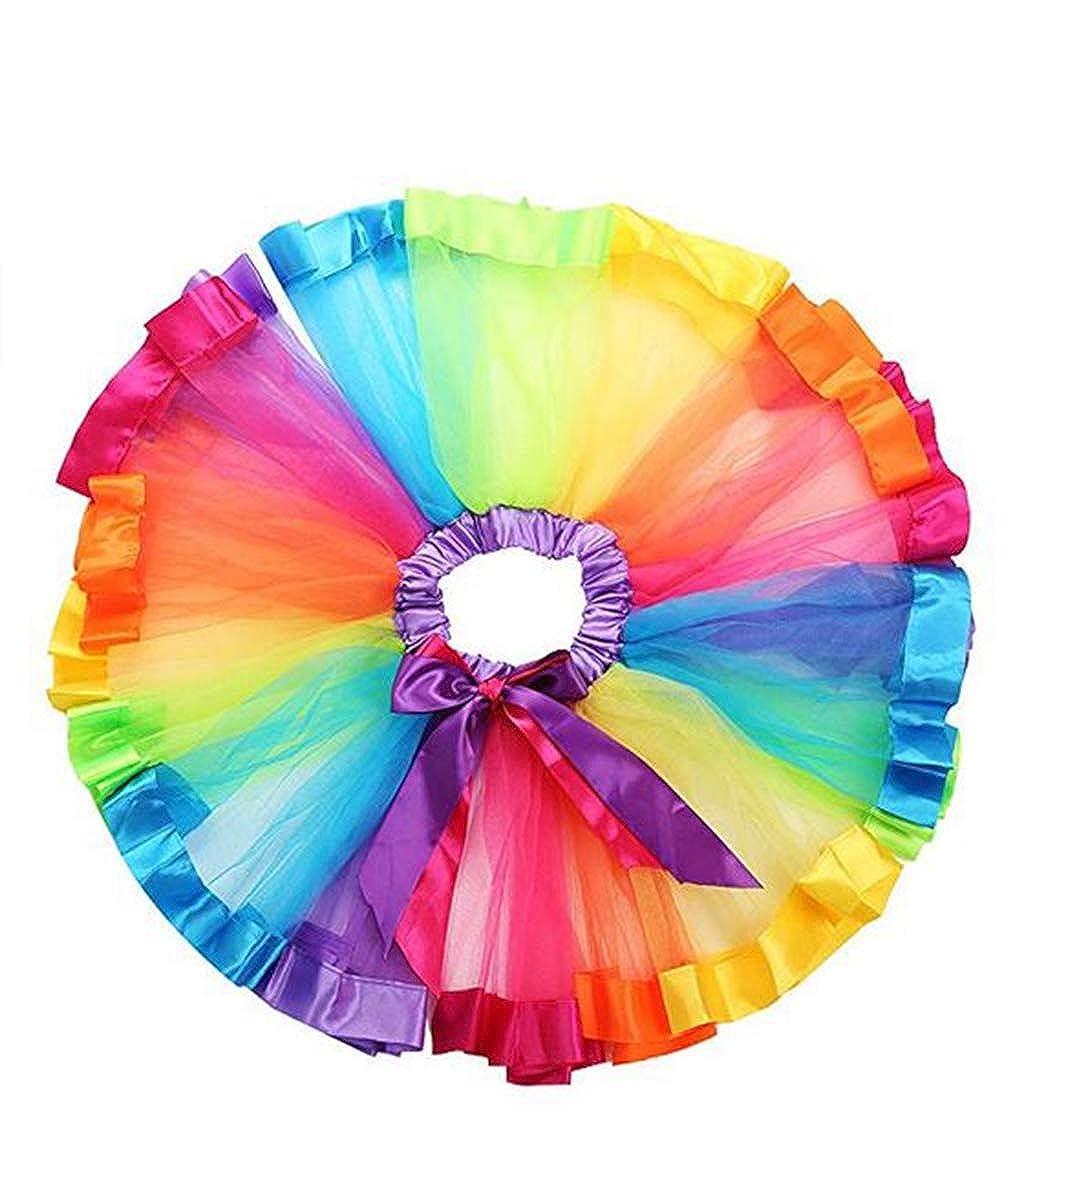 Tempura 女の子用 レイヤード レインボー チュチュスカート ダンスドレス フリル ティアード バレエ チュール スカート 誕生日パーティー ドレスアップ S (0-2Y)  B07J5V9NH2